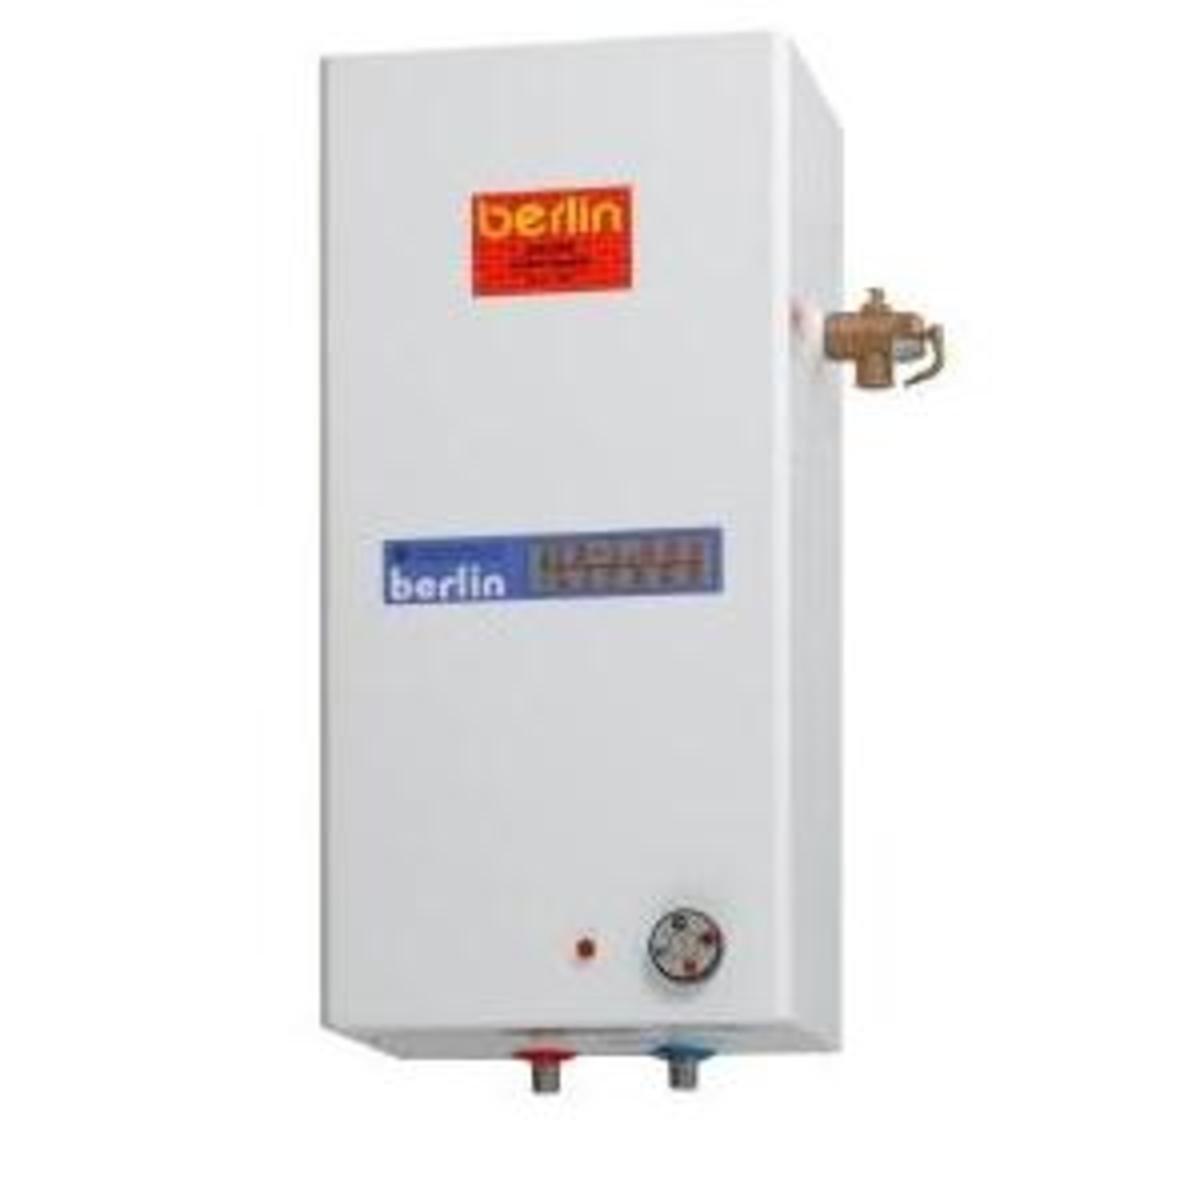 3kw 25公升中央儲水式熱水爐 UHP6.5 (原價$4000, 特價$2970)